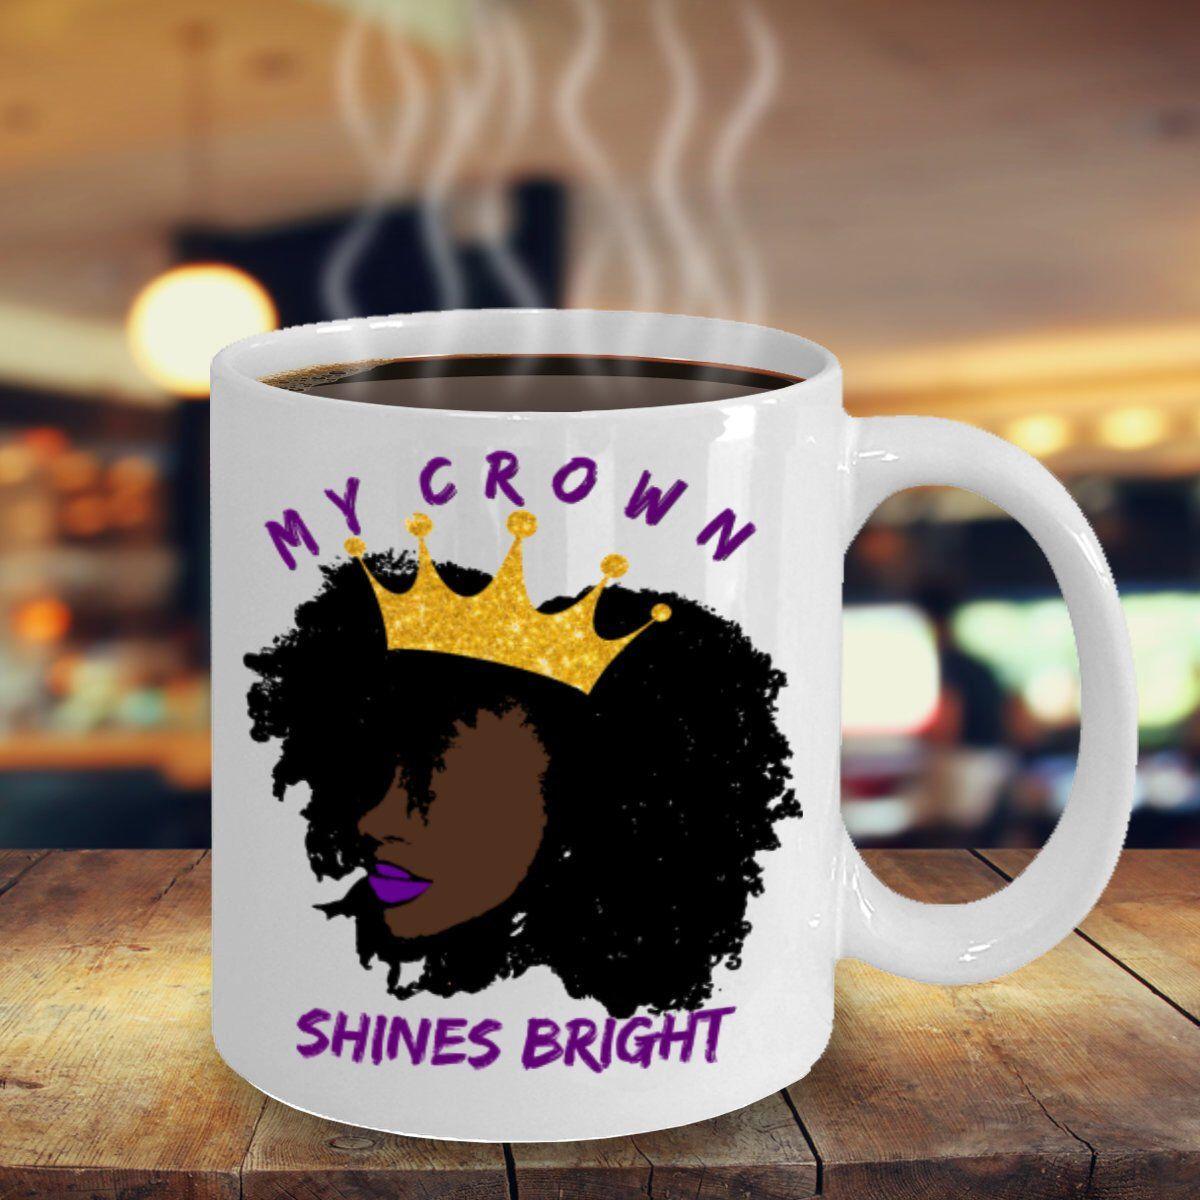 Hairstyles With Crown Queen: Afrocentric Mug, Melanin Mug, Queen Mug, Crown Mug, Afro